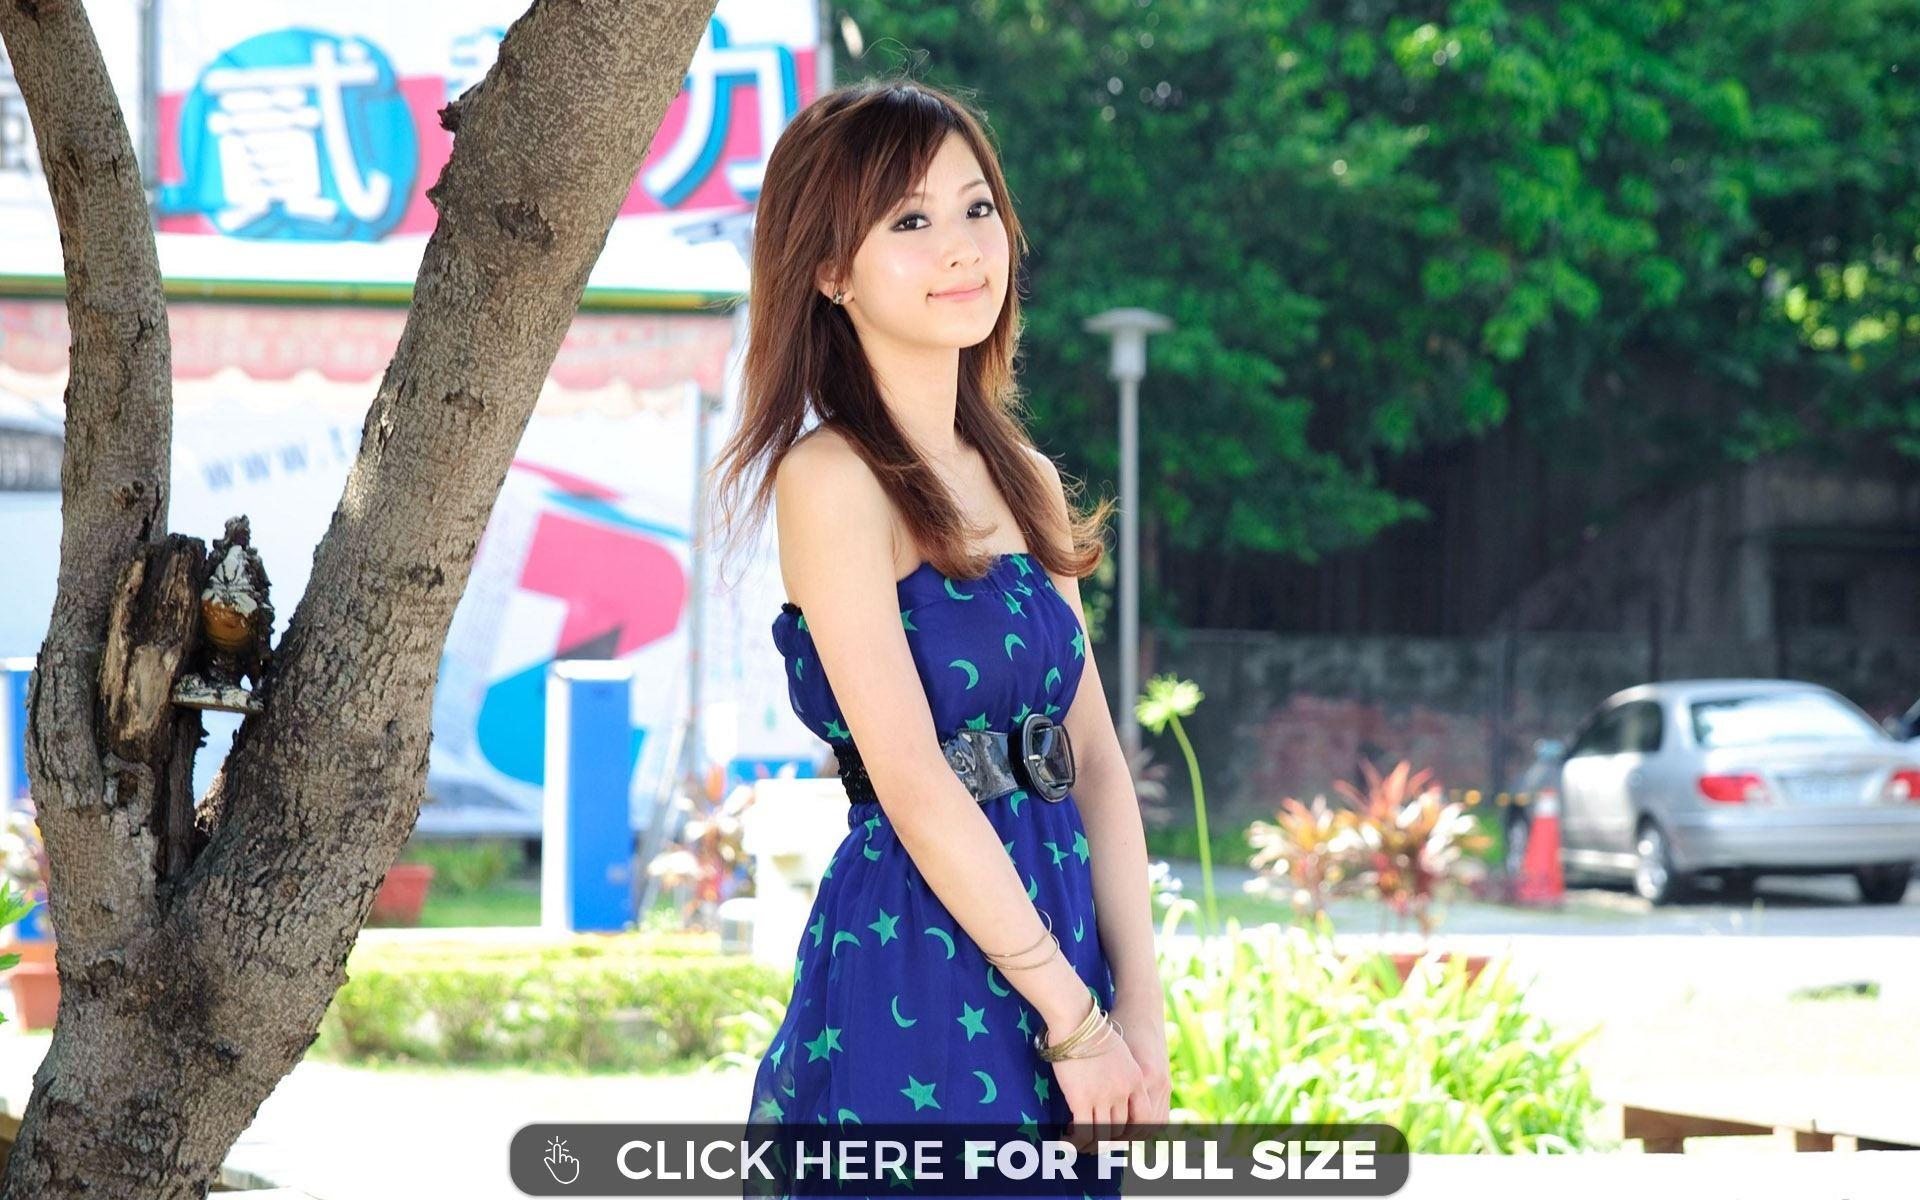 beautiful chinese girl wallpaper   desktop wallpapers   pinterest